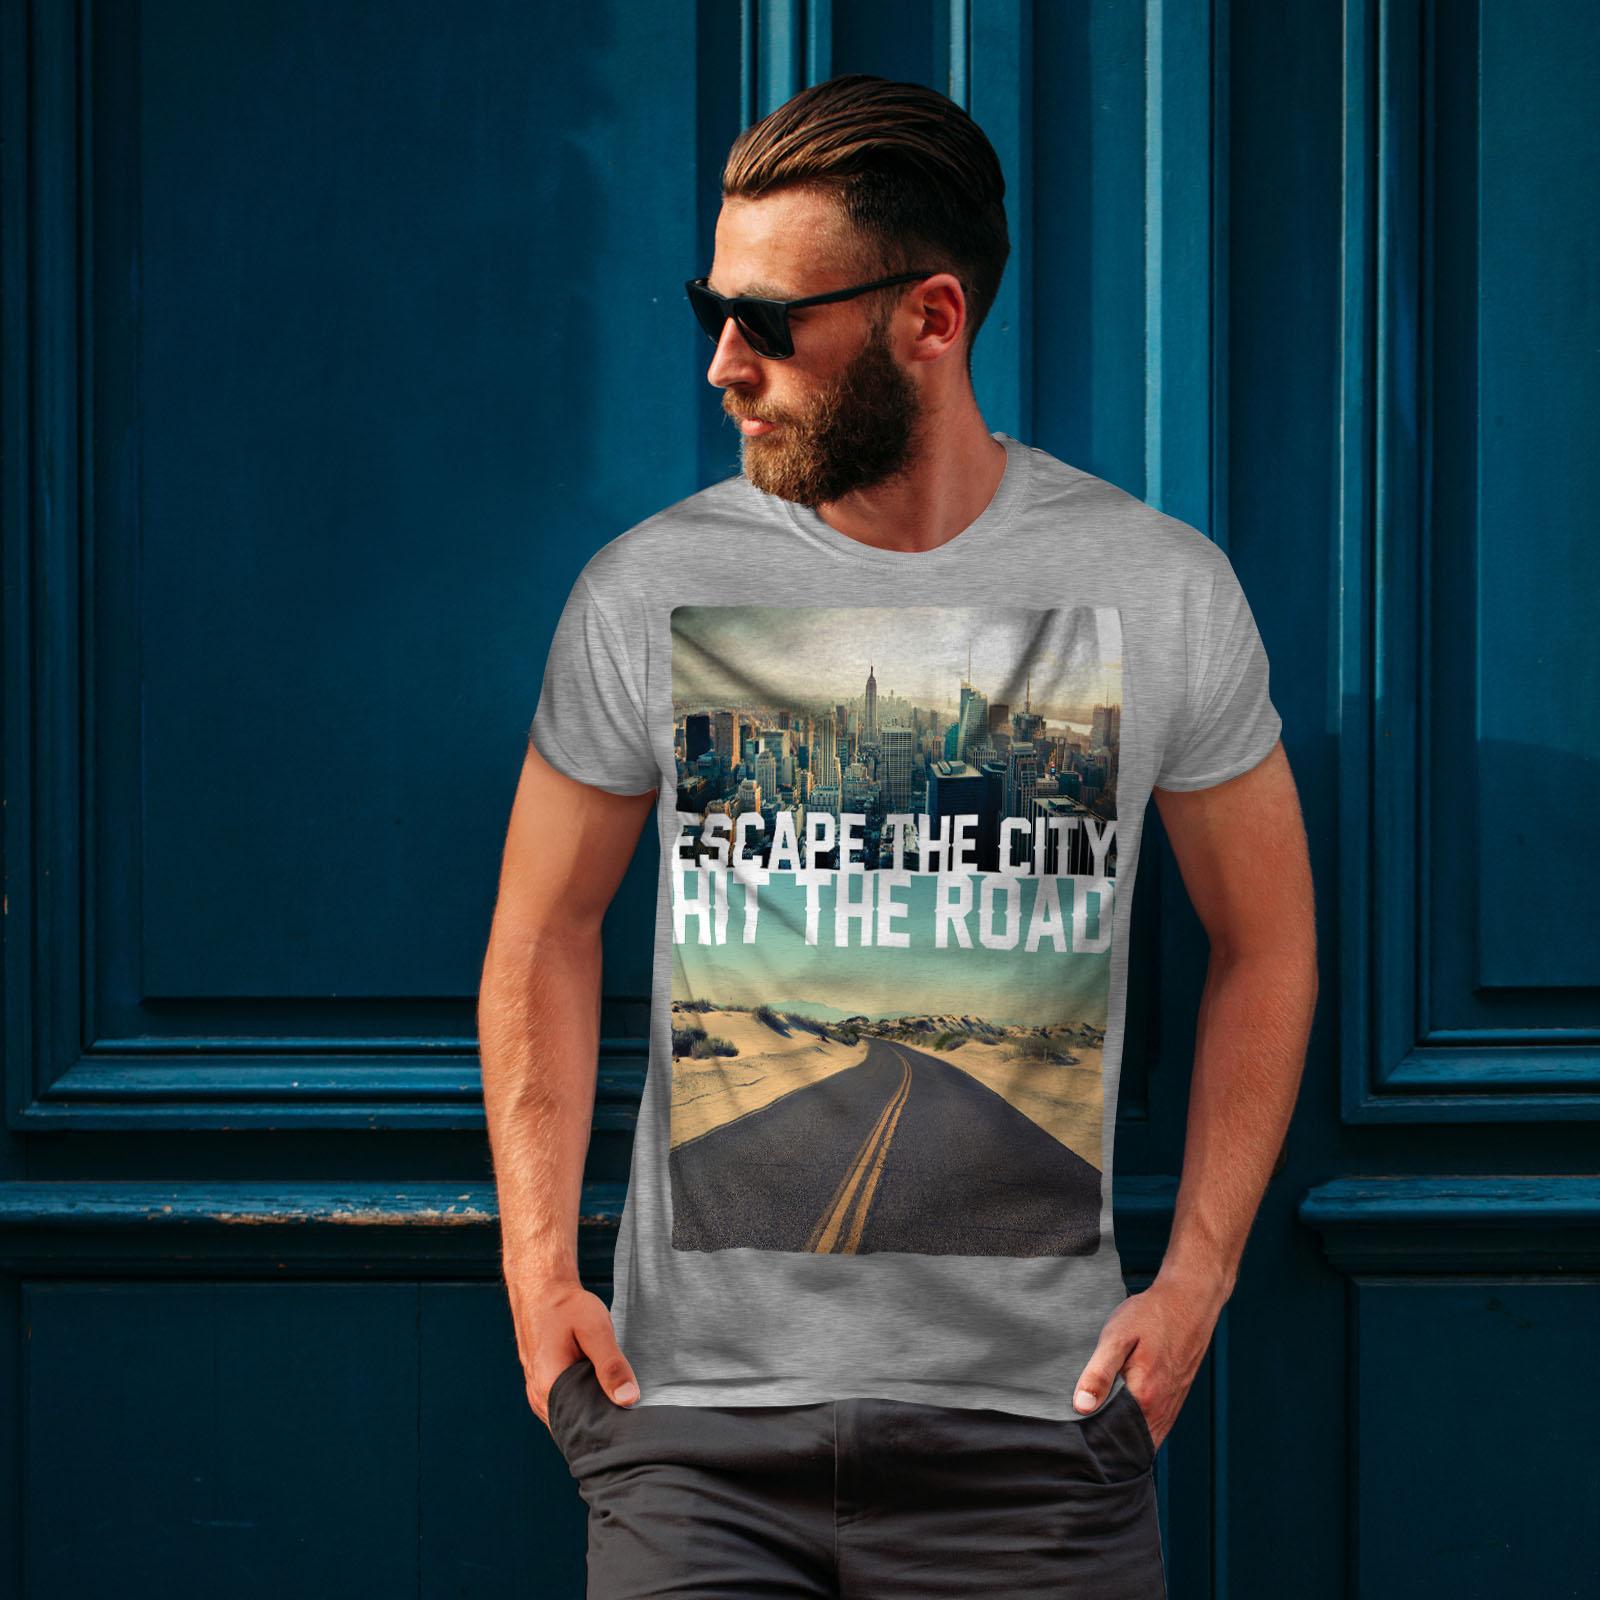 Wellcoda-Escape-The-City-Herren-T-Shirt-Lifestyle-Grafikdesign-Printed-Tee Indexbild 16